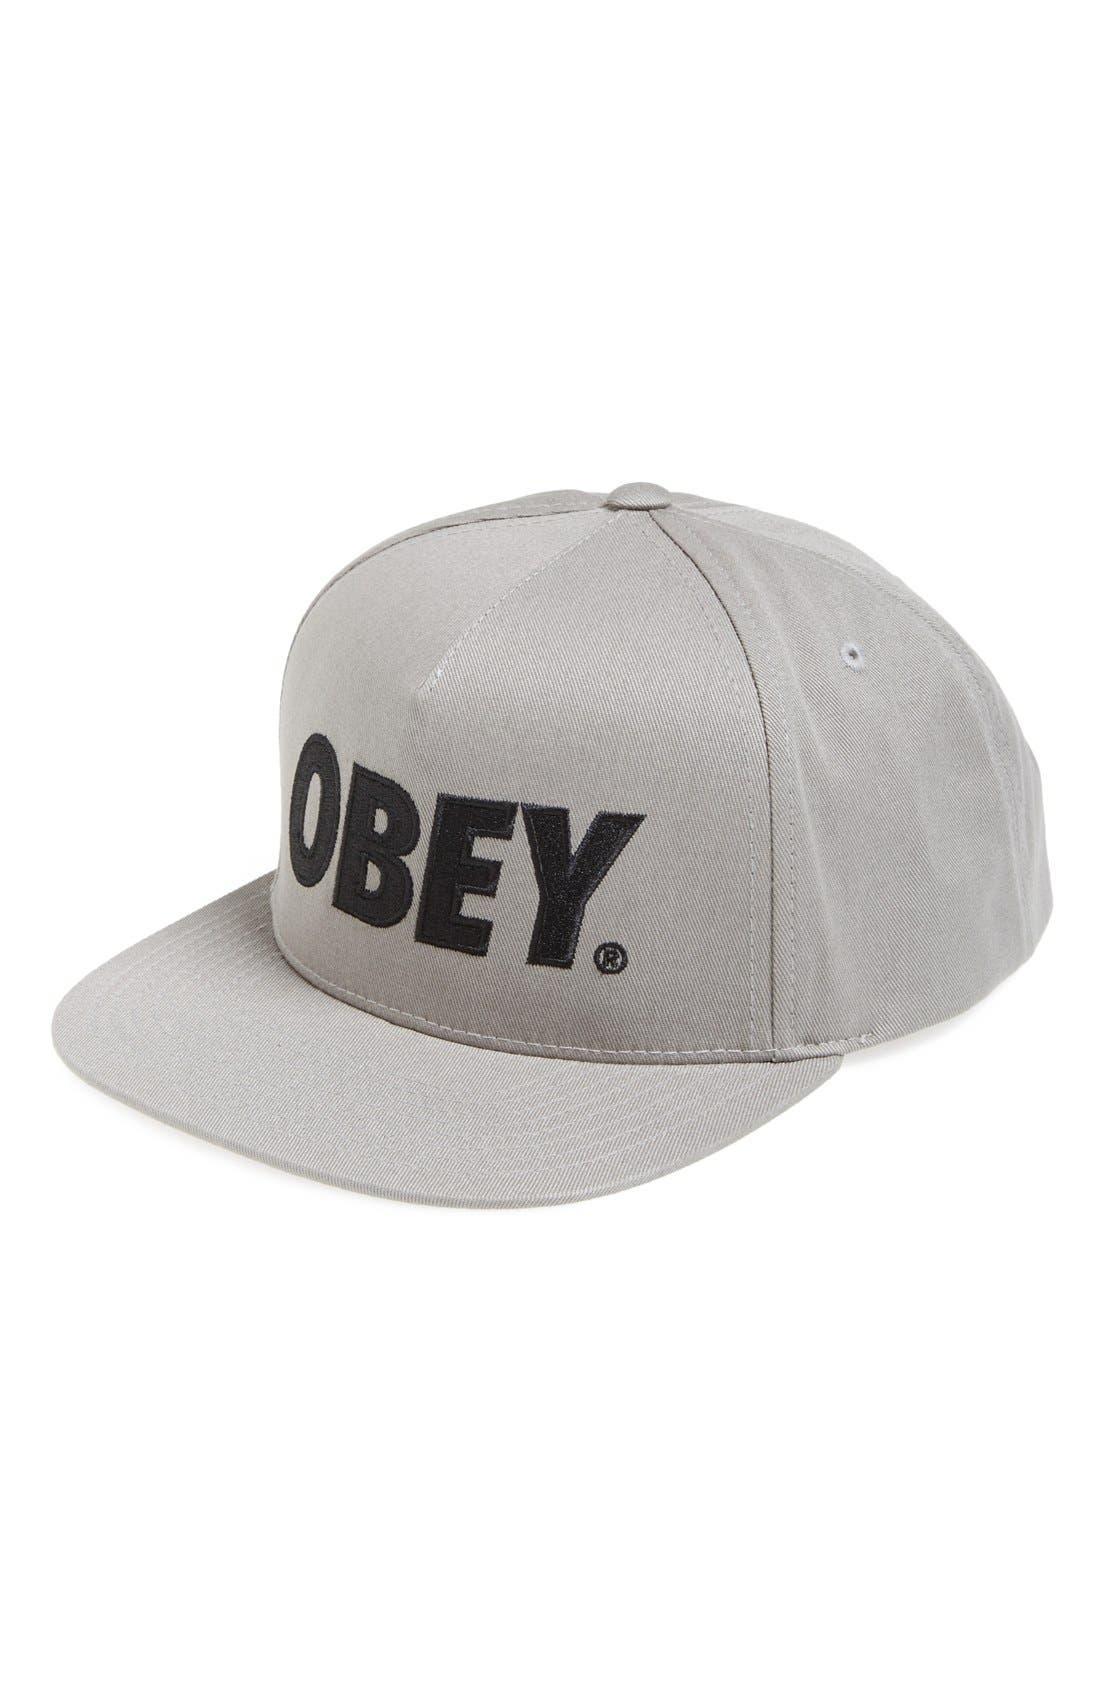 Main Image - Obey 'The City' Snapback Baseball Cap